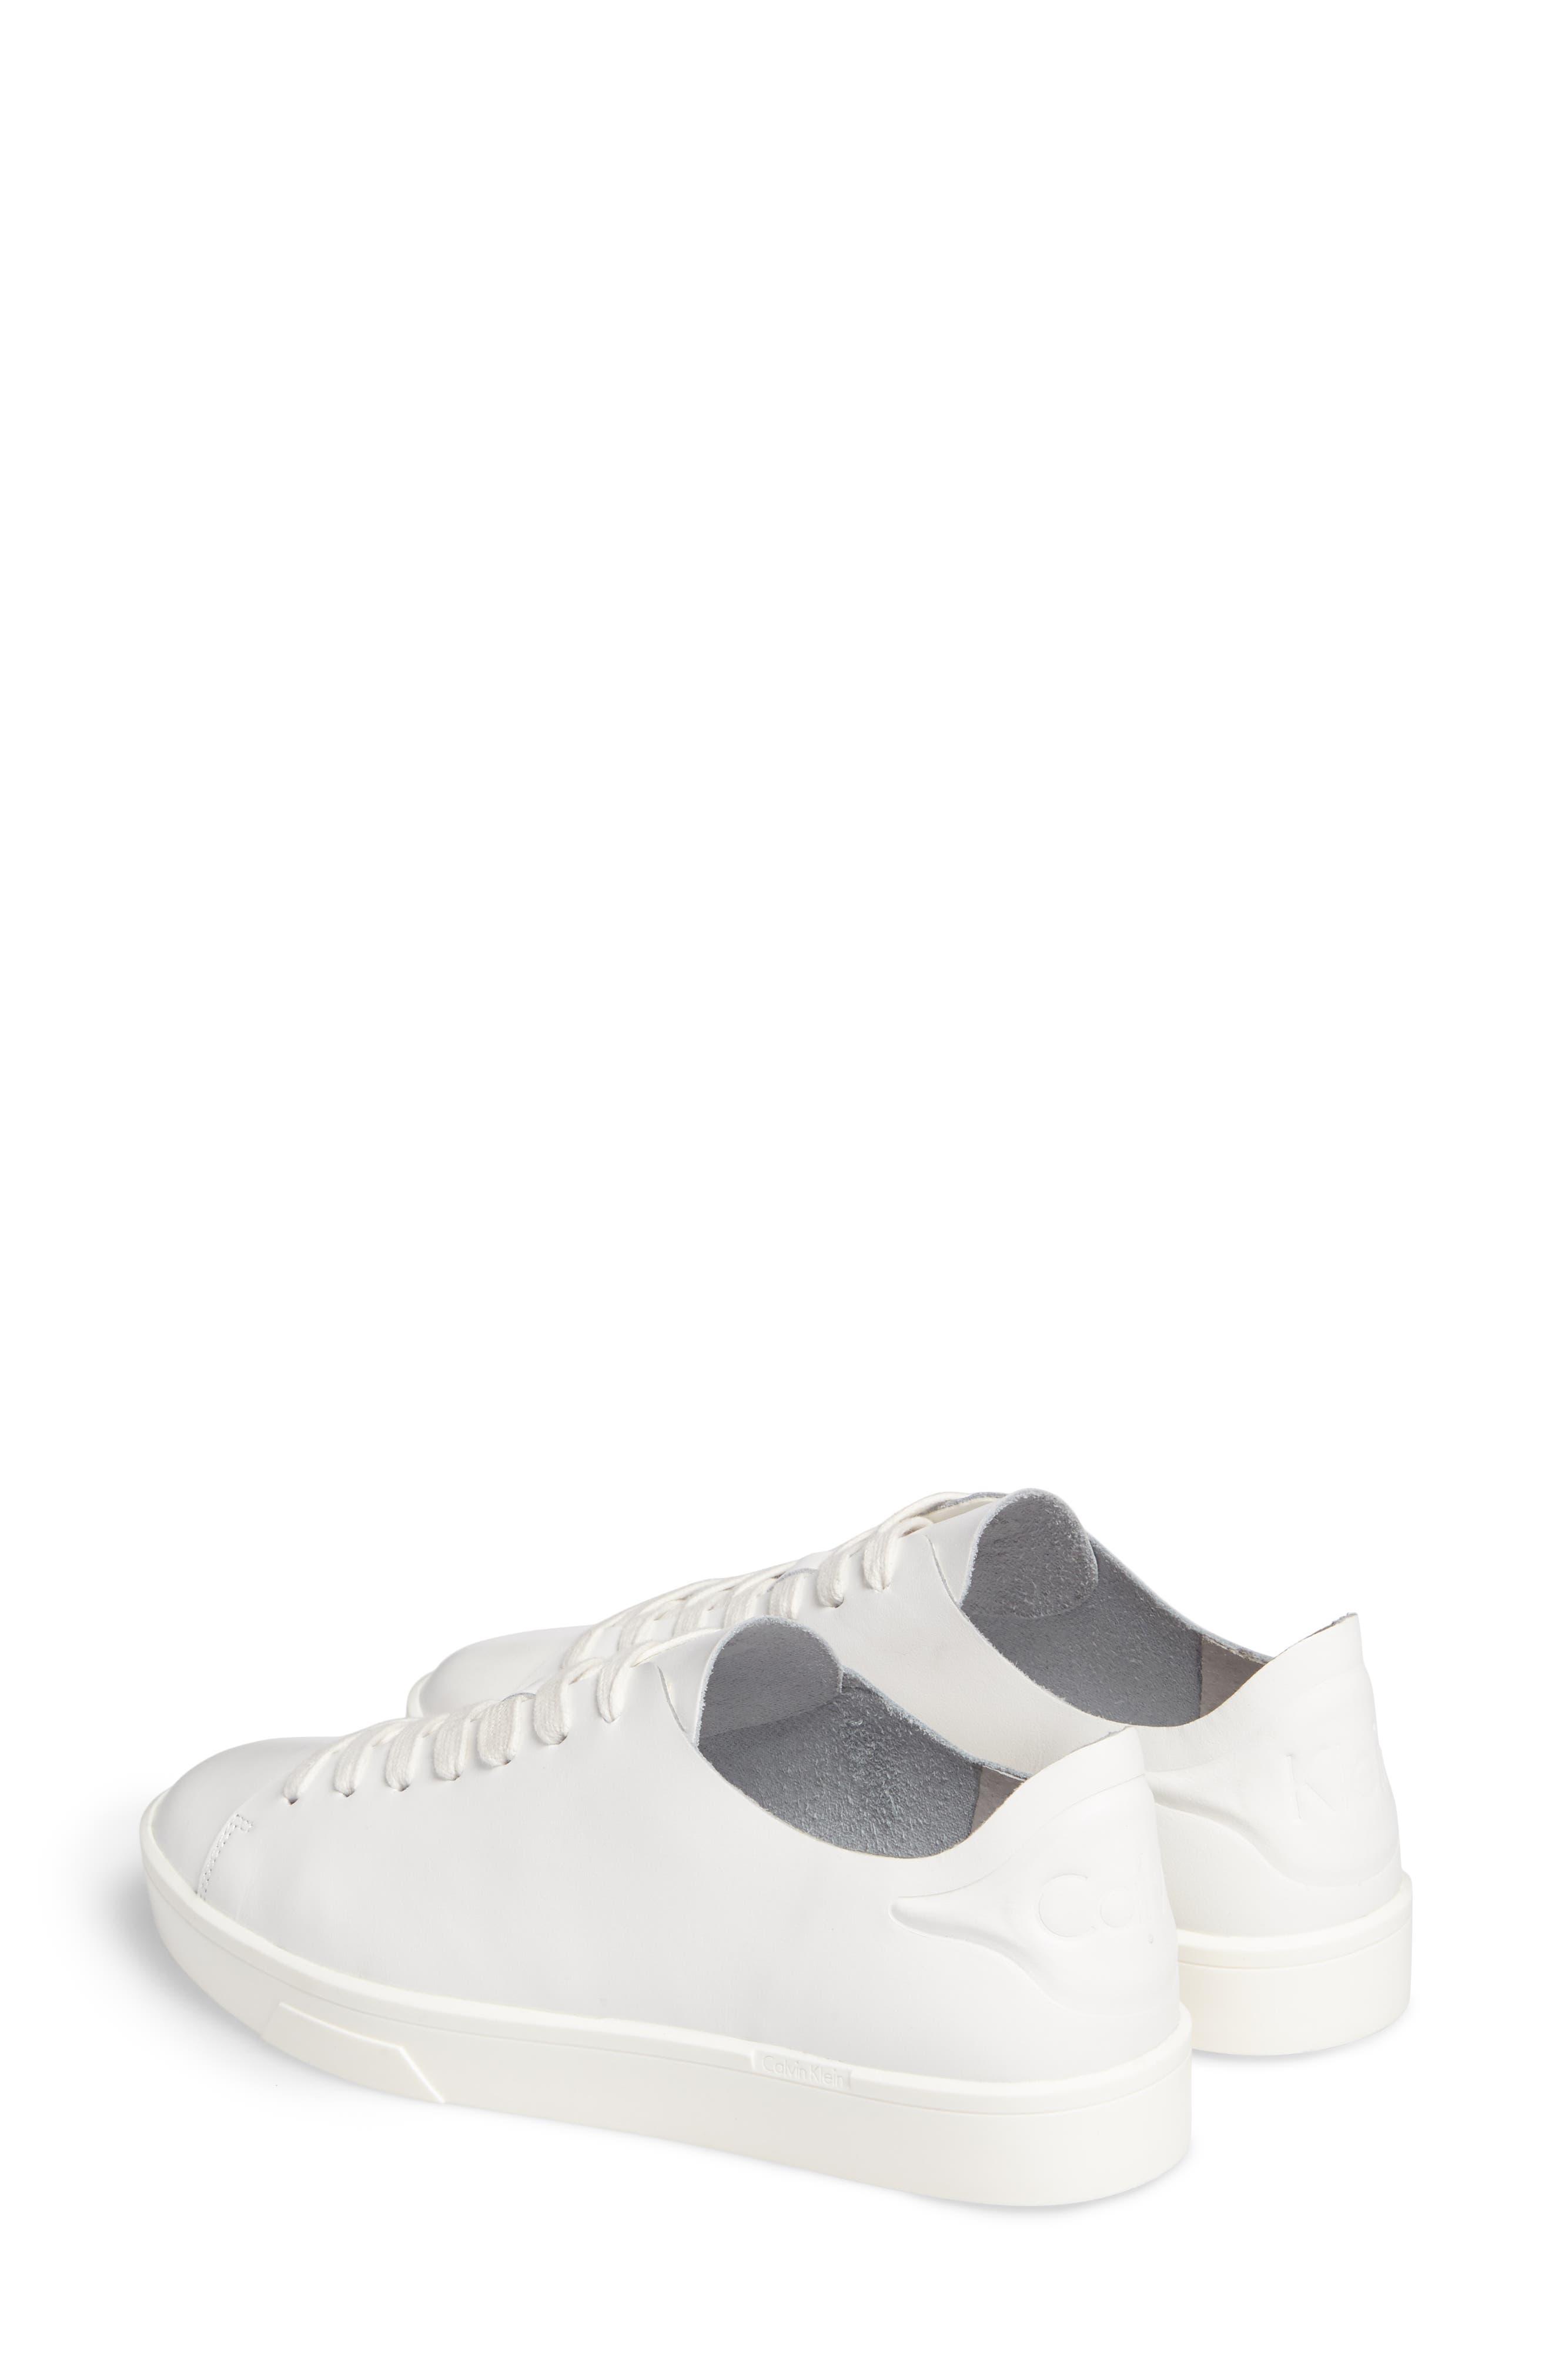 Irena Sneaker,                             Alternate thumbnail 2, color,                             134